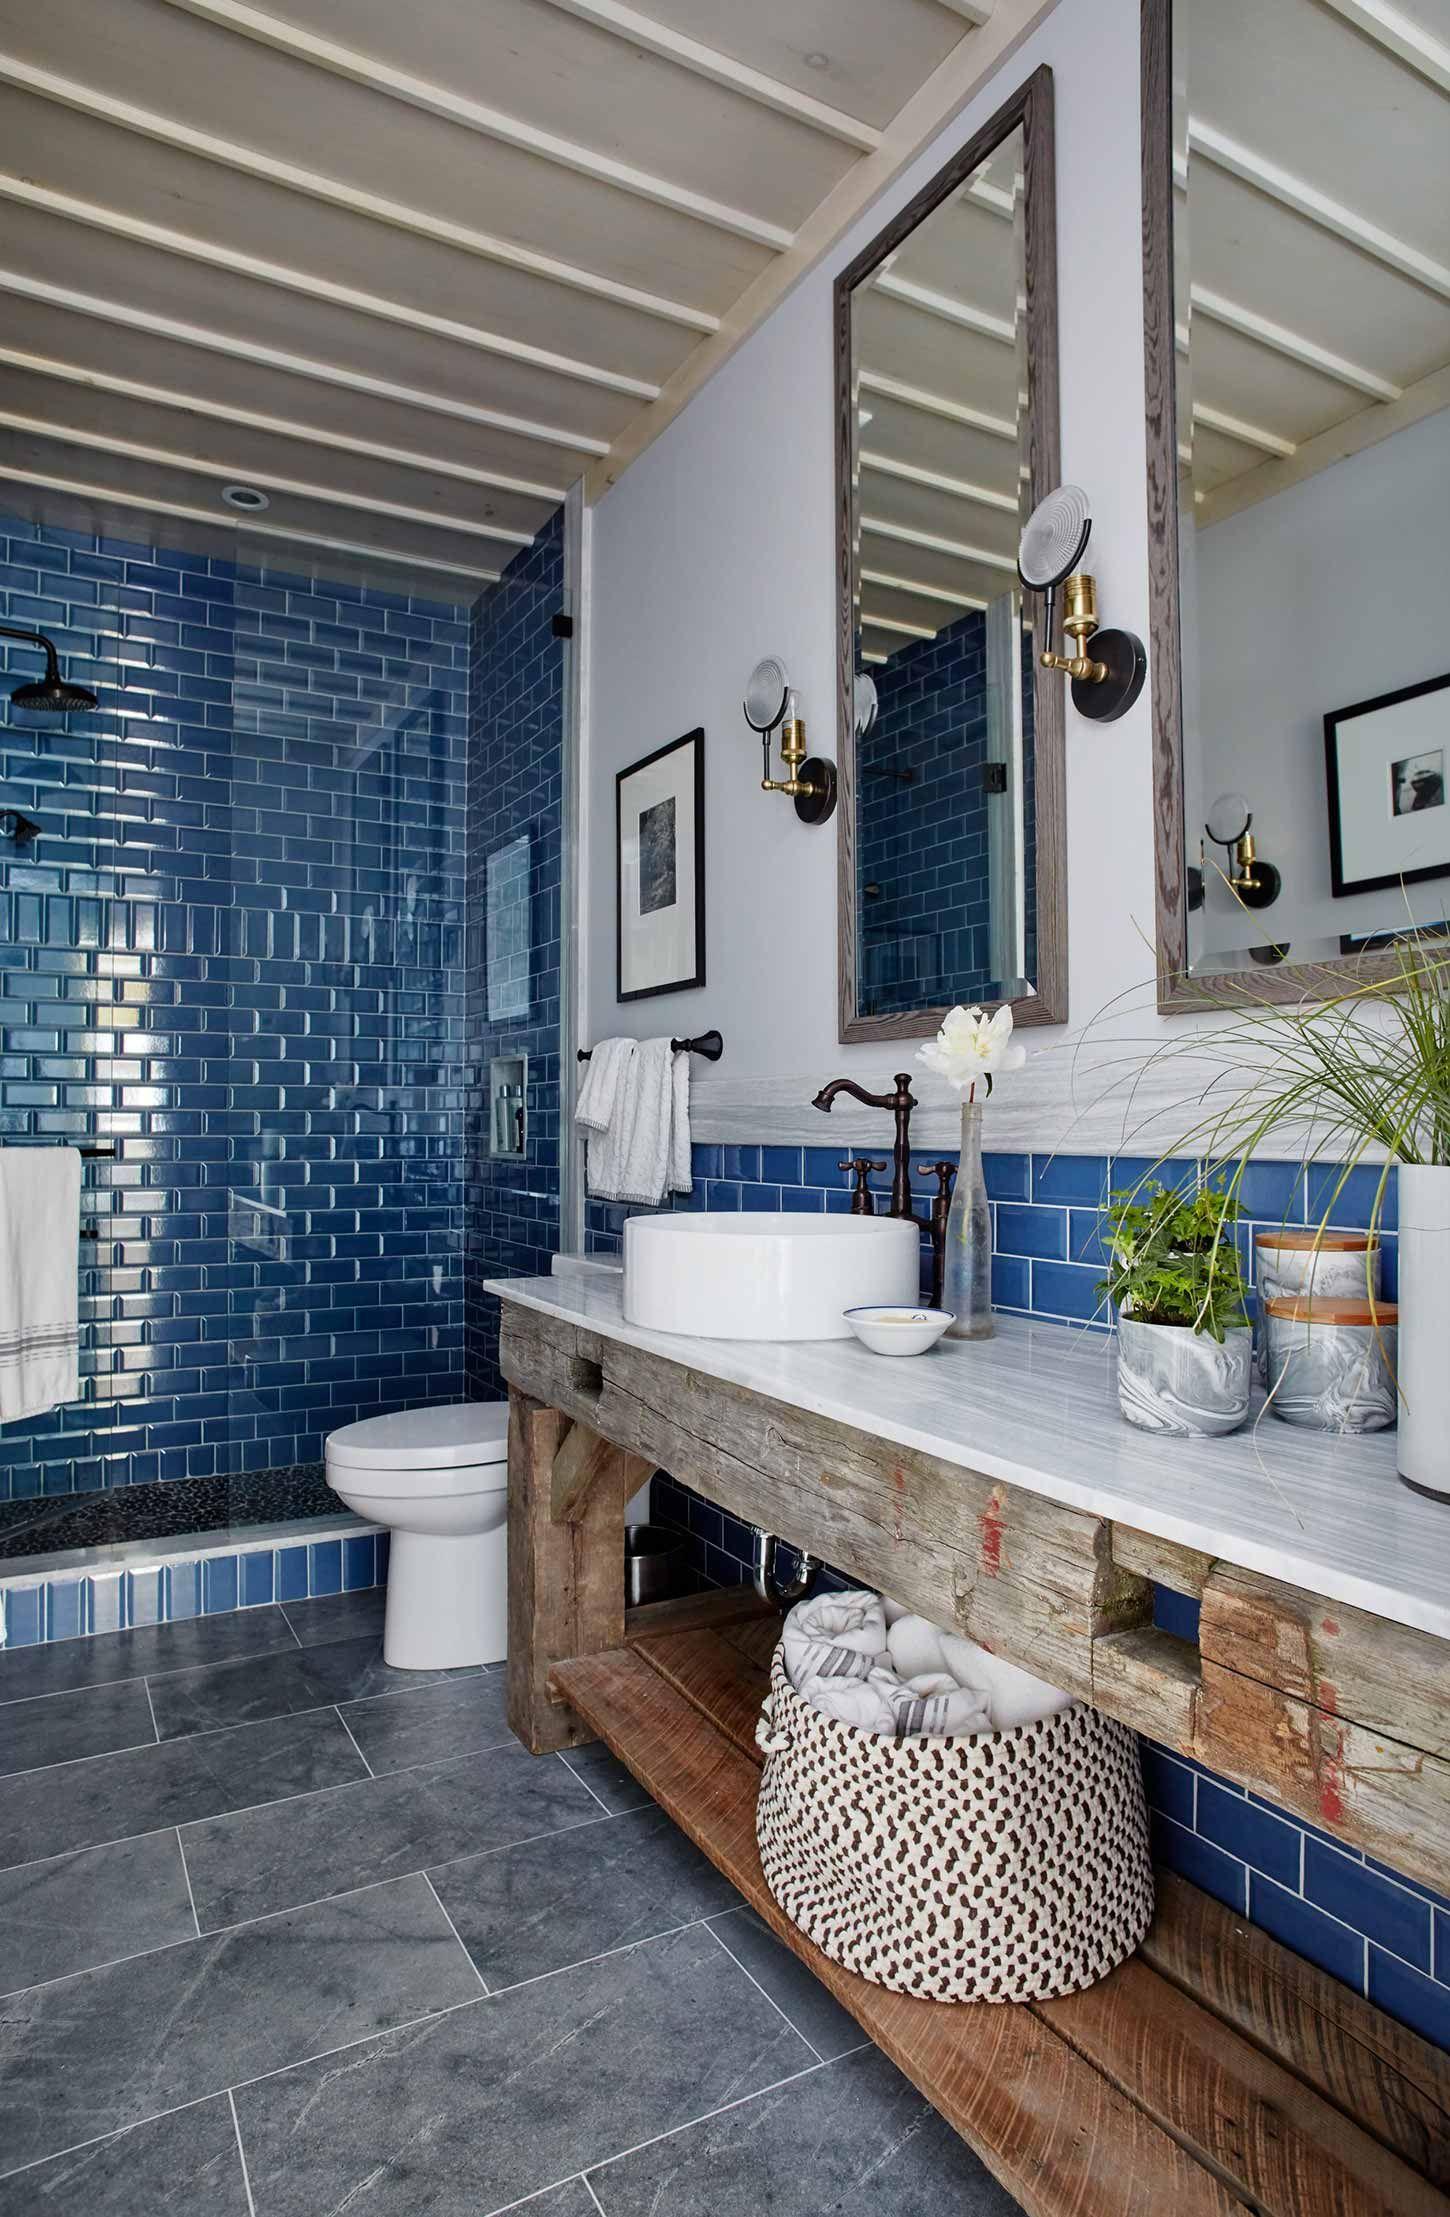 Sarah Richardson Off The Grid sarah off the grid: guest bathroom